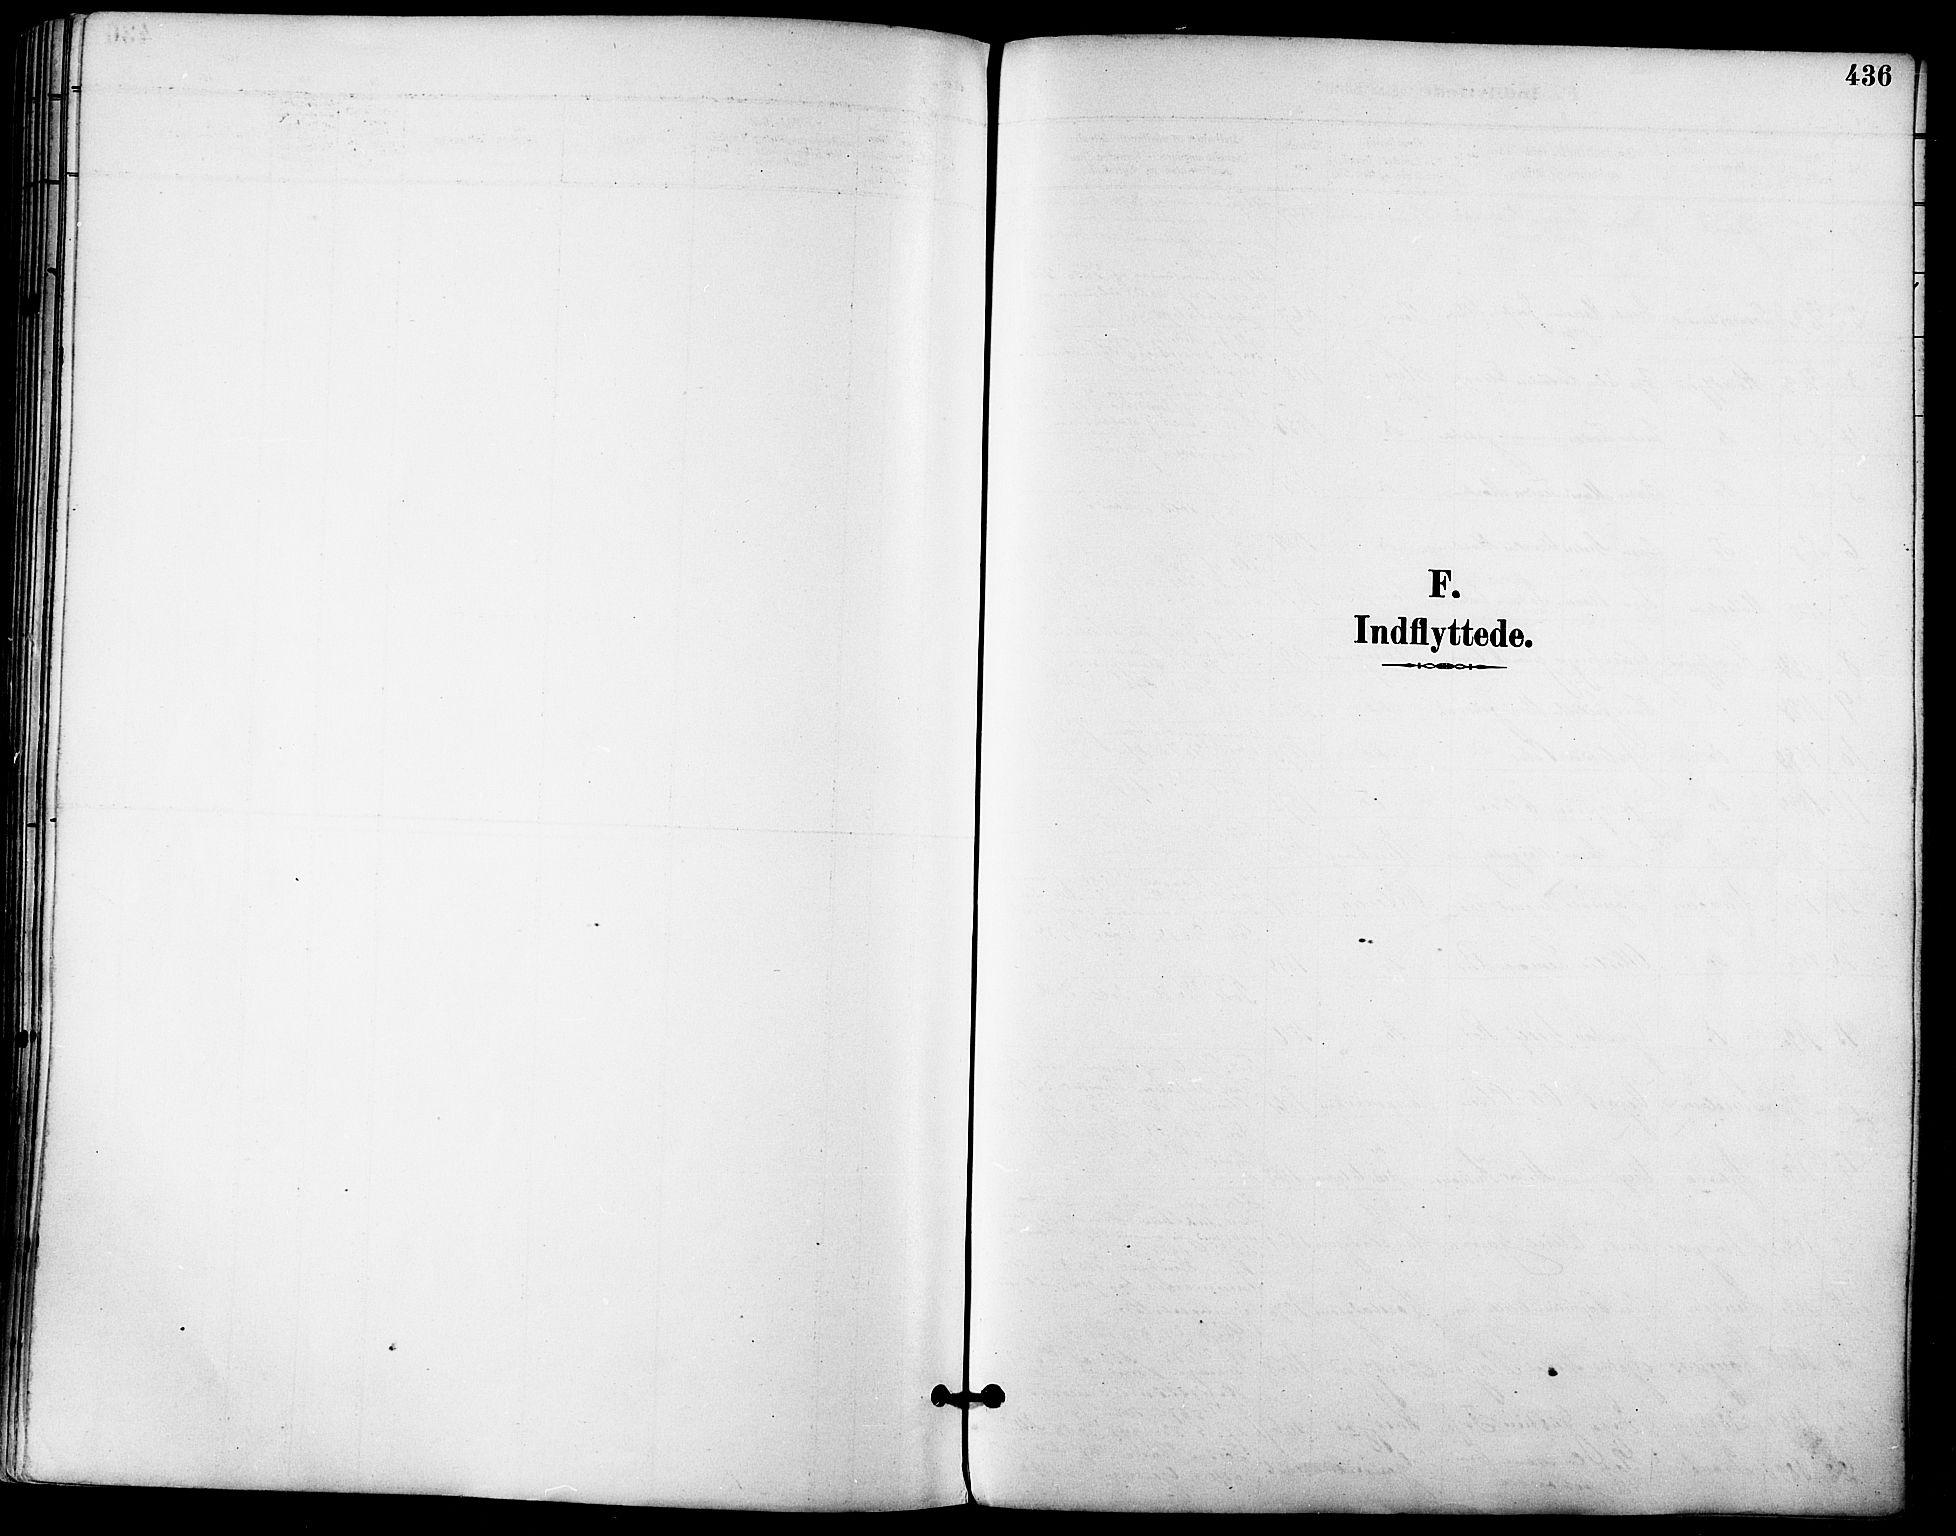 SATØ, Trondenes sokneprestkontor, H/Ha/L0016kirke: Parish register (official) no. 16, 1890-1898, p. 436